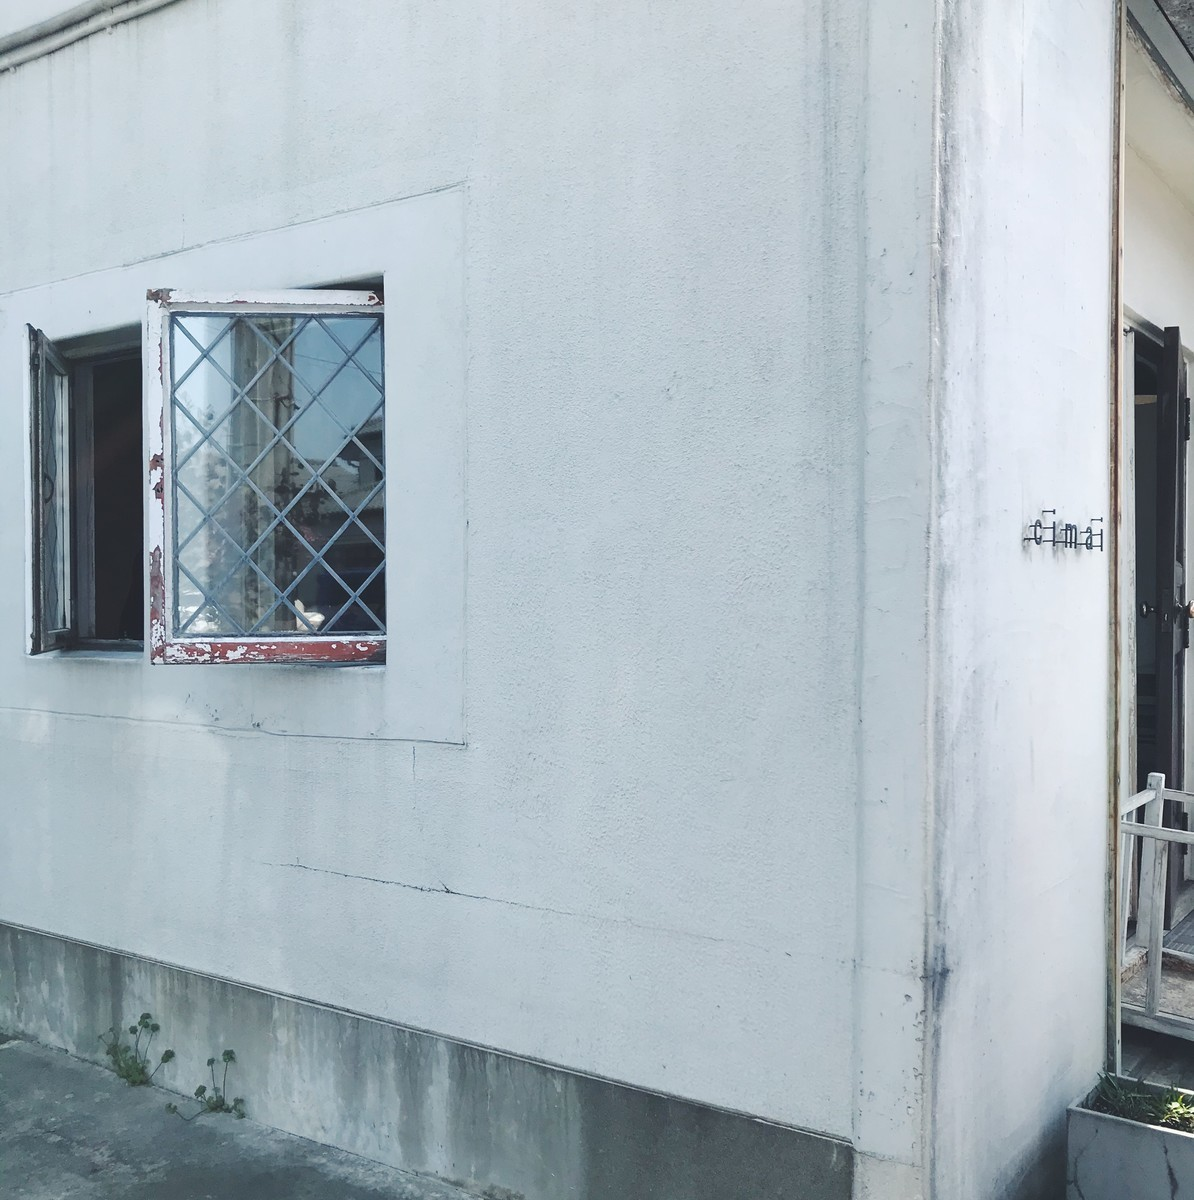 f:id:asacafe:20200407204434j:plain